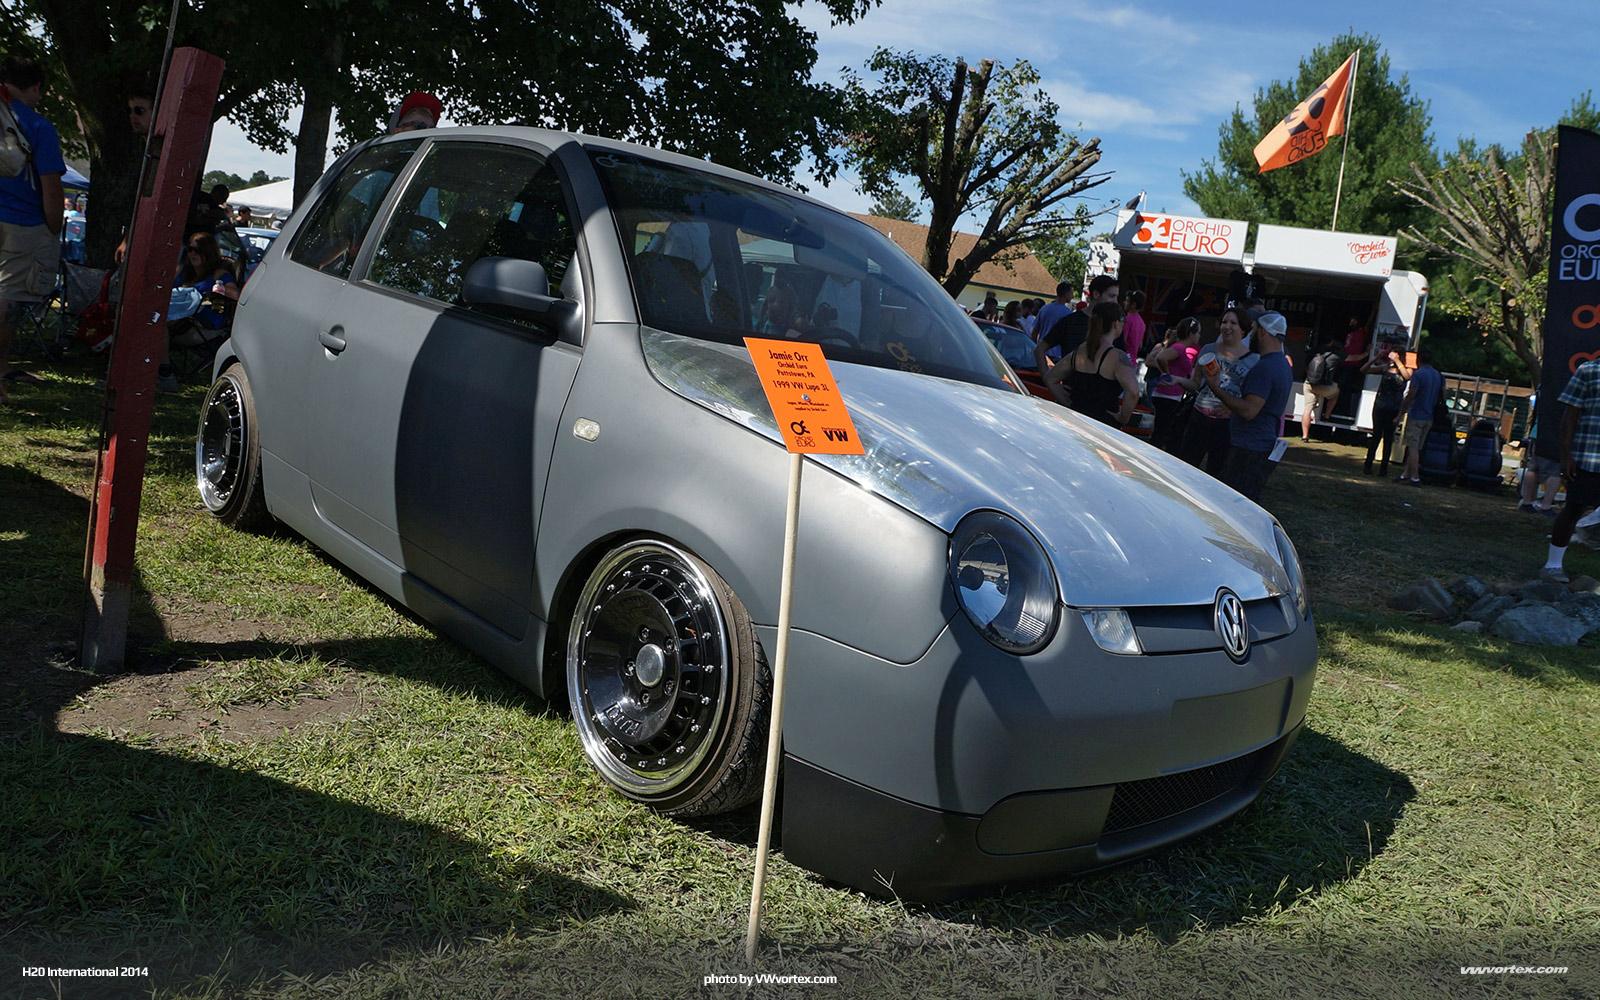 2014-H20i-H20-International-VW-Volkswagen-Audi-476